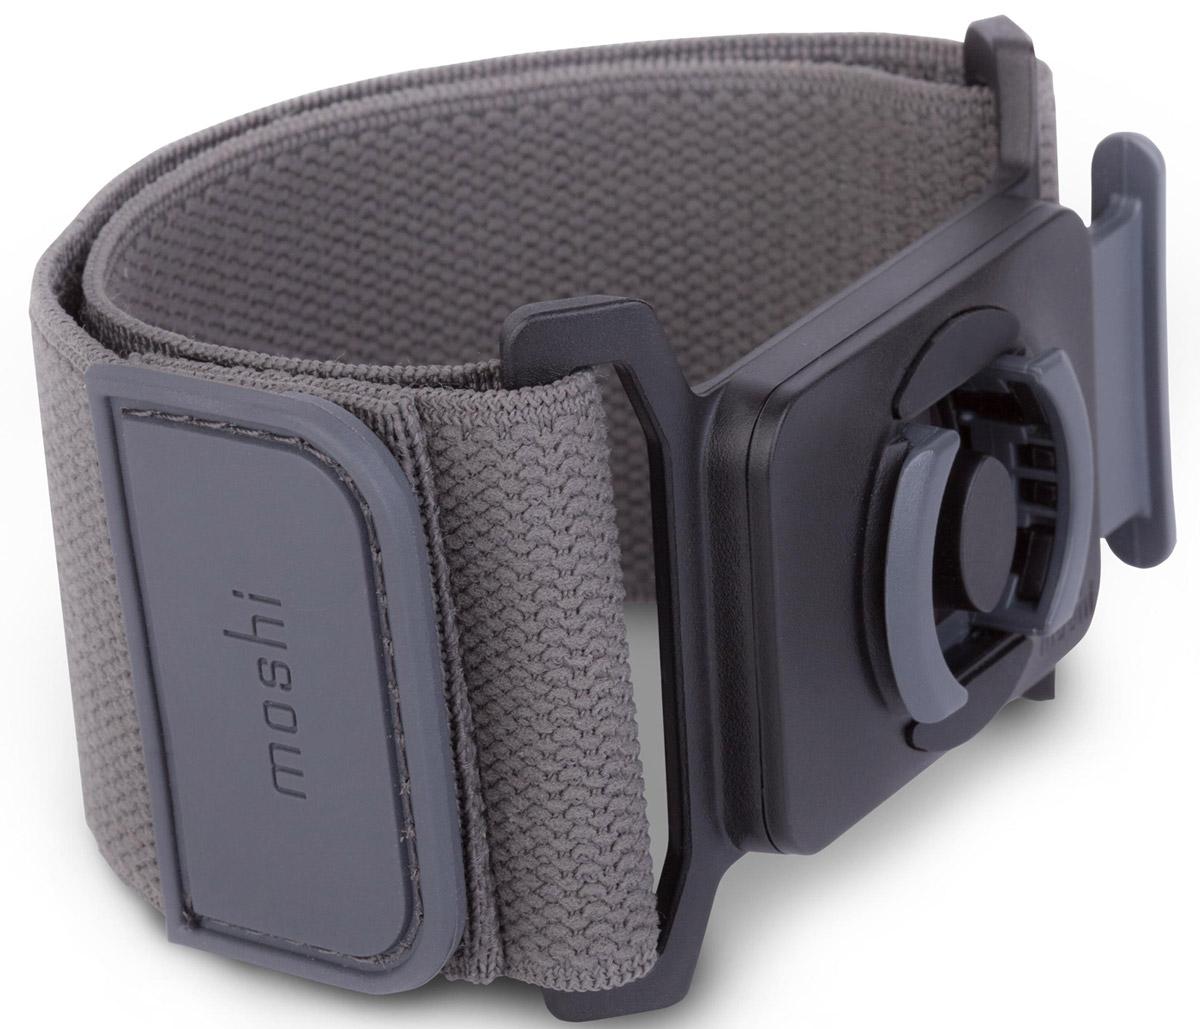 Moshi Armband, Black чехол на руку для смартфона99MO086003